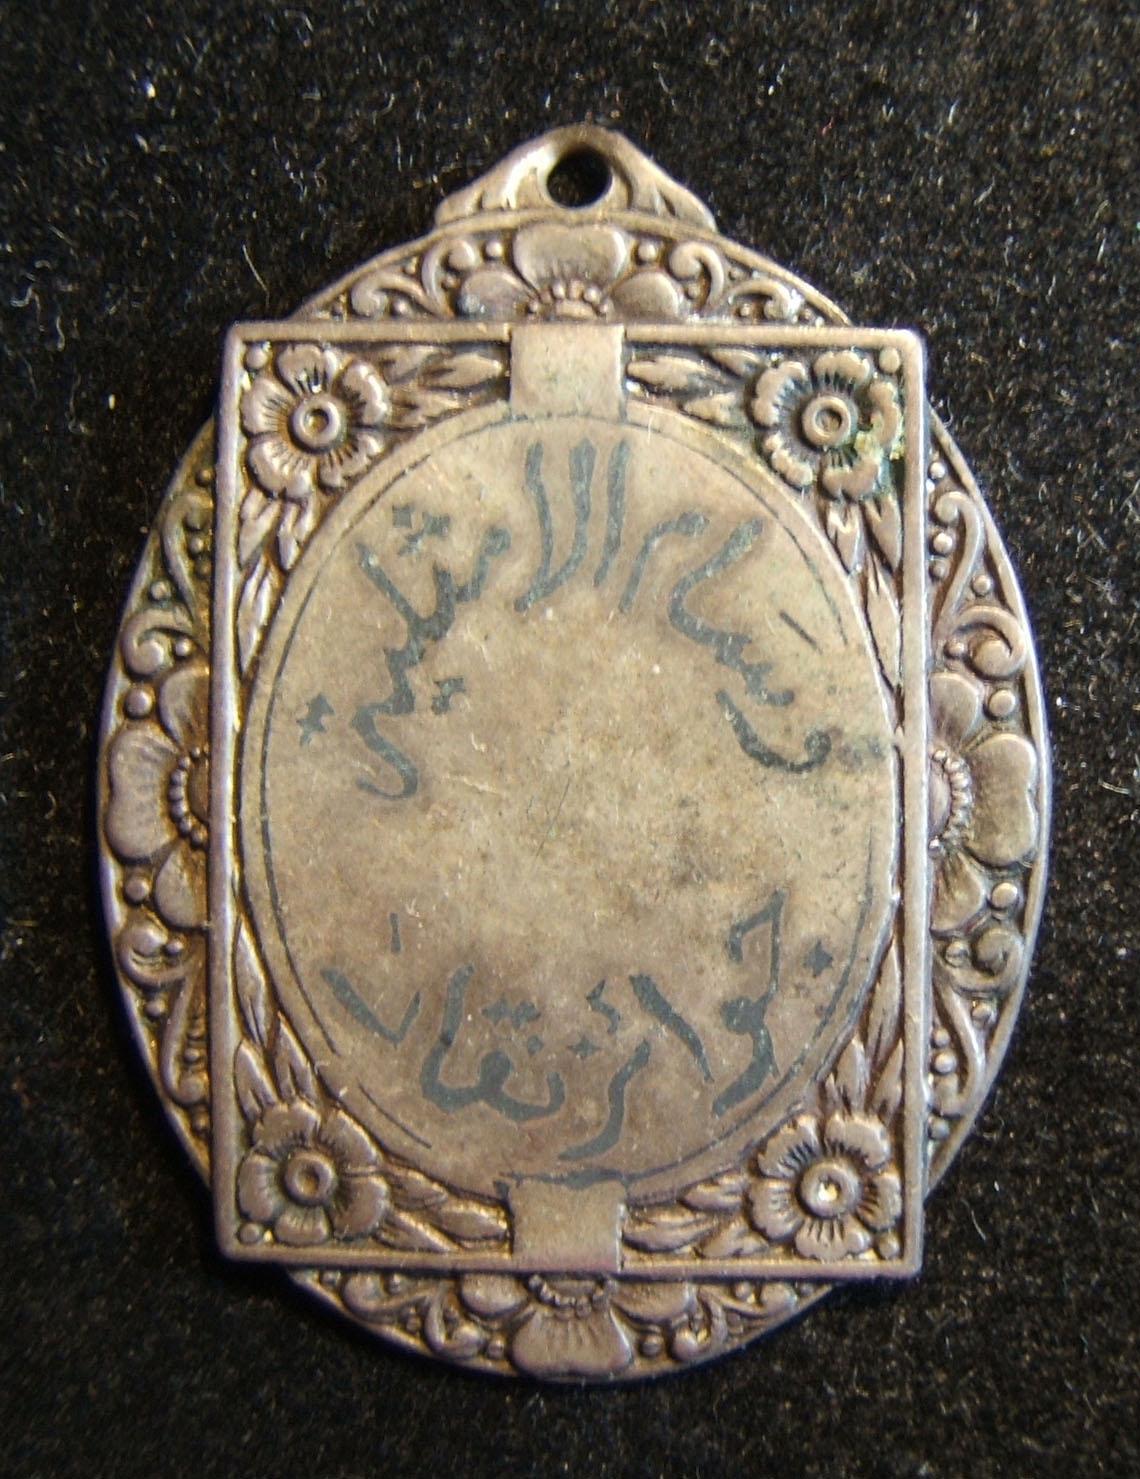 Jordan(?): ornate award in white metal (silver?); size: 26.5 x 35 mm; weight: 4.5g. Obverse legend, paint on metal: